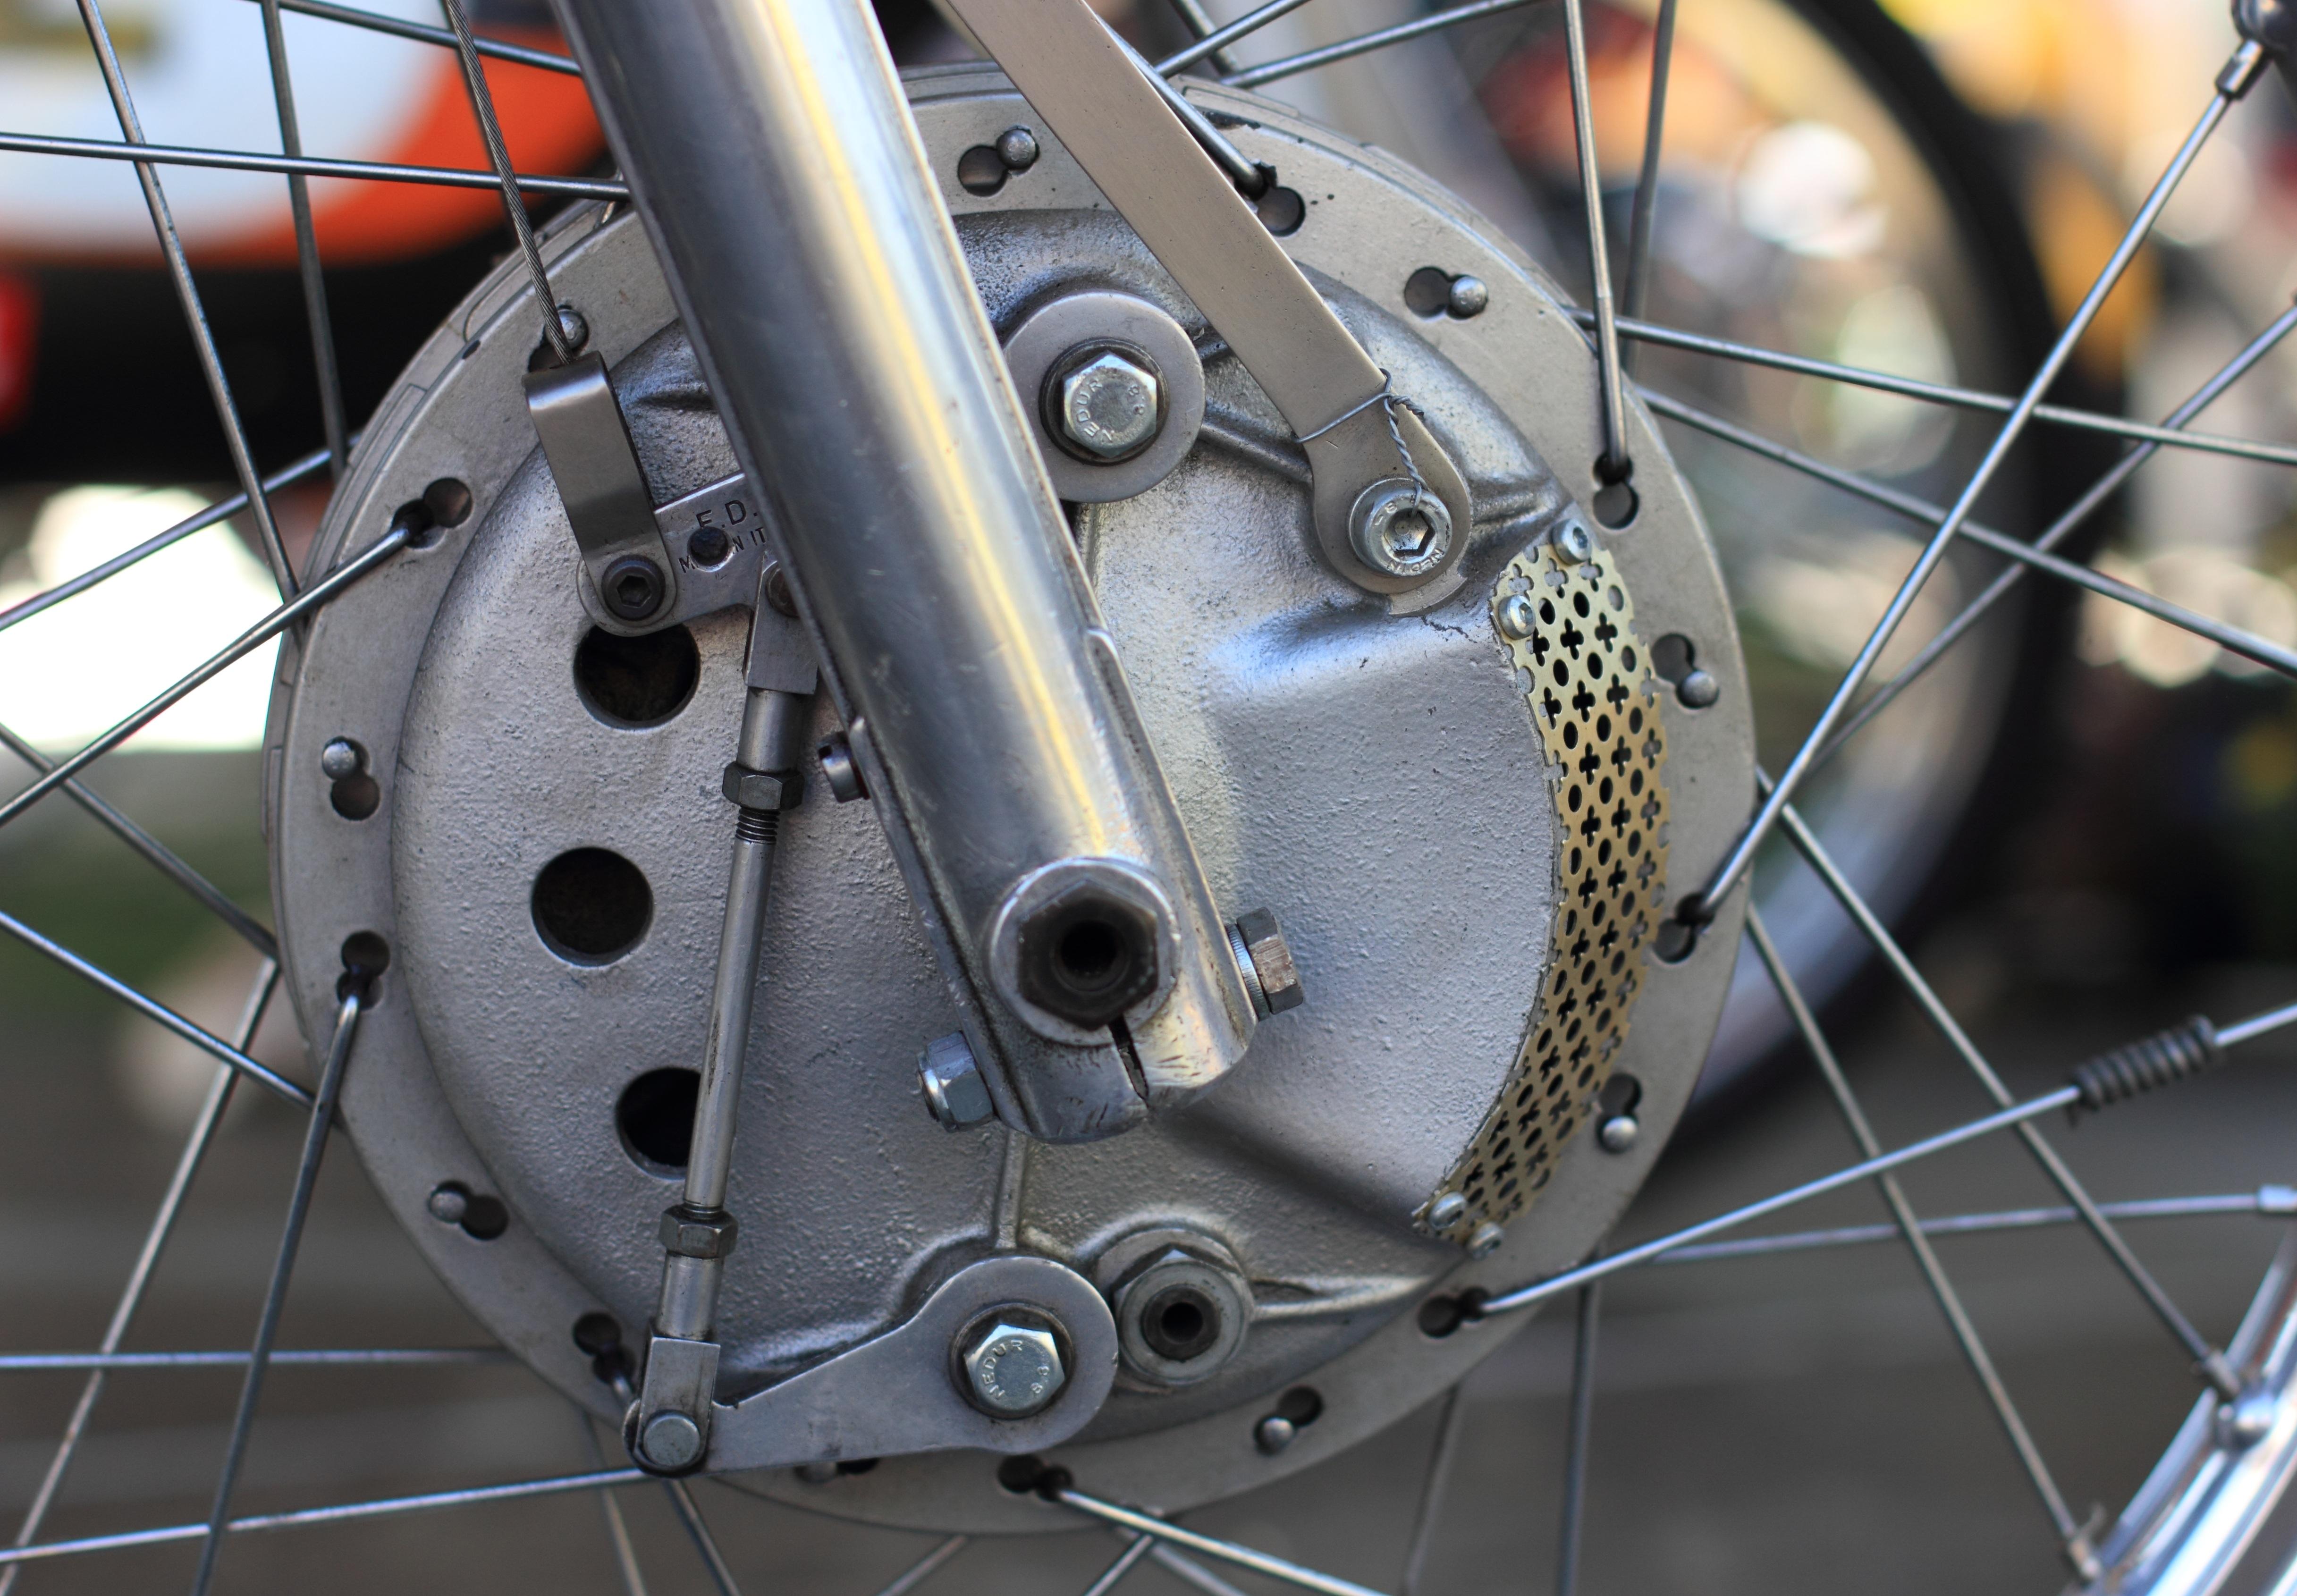 Kostenlose foto : Rad, Treffen, Fahrzeug, Speiche, Motorrad, Trommel ...